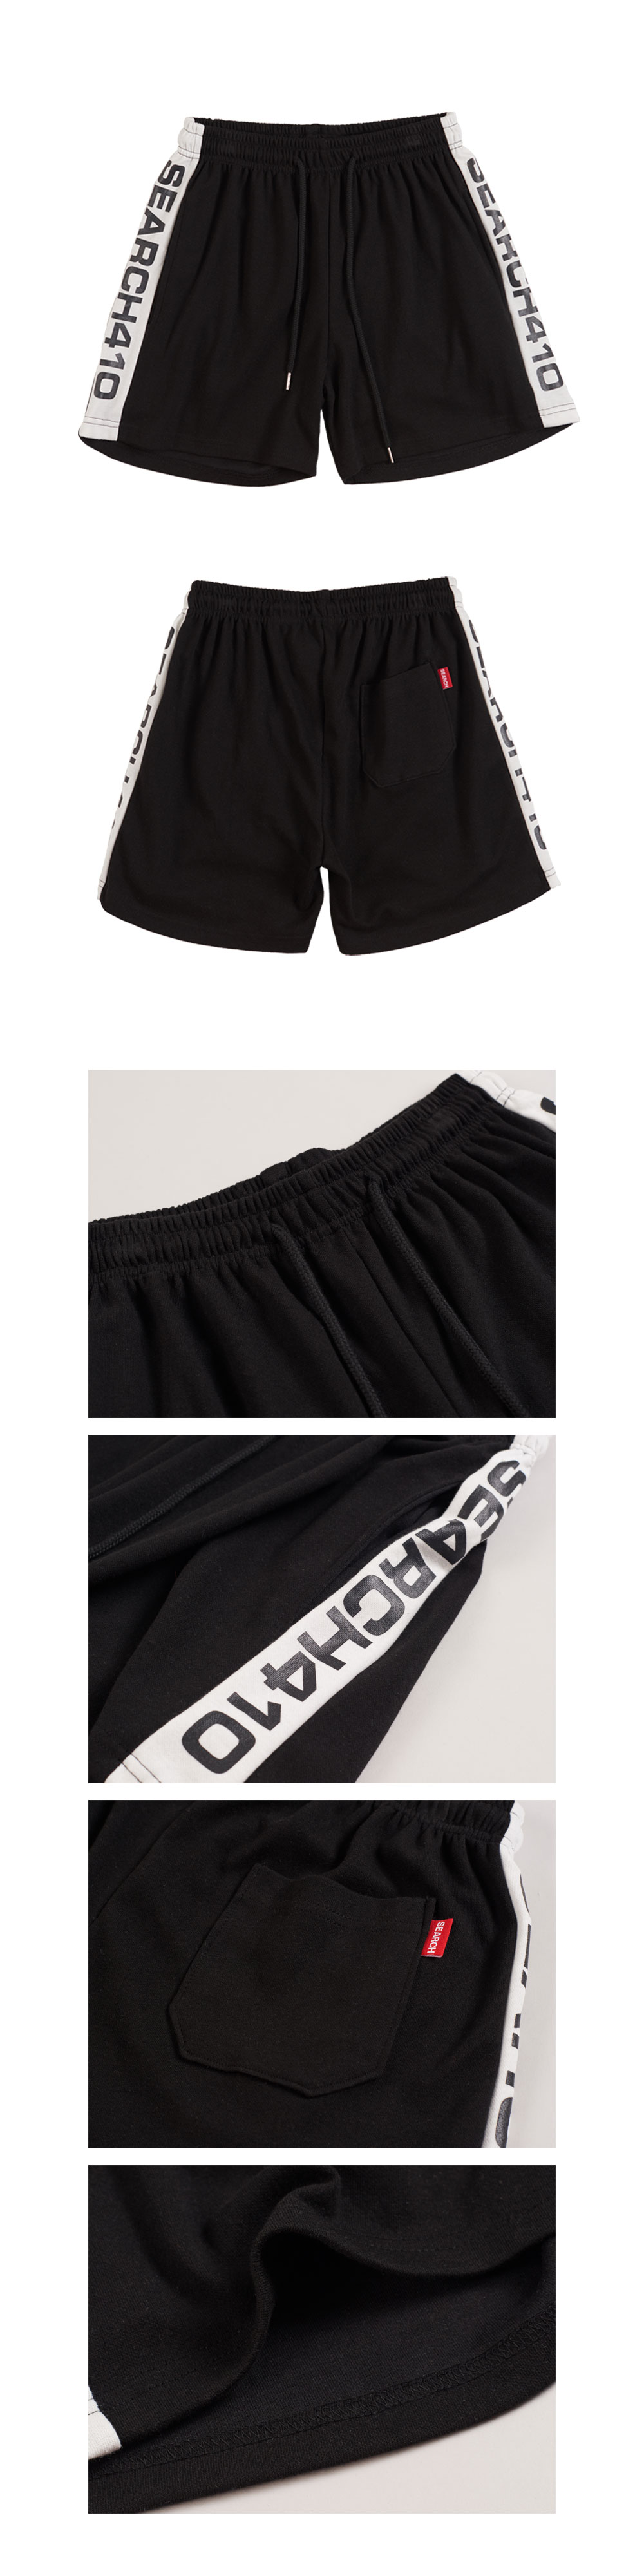 [UNISEX] SIDELOGO SHORTS_BLACK